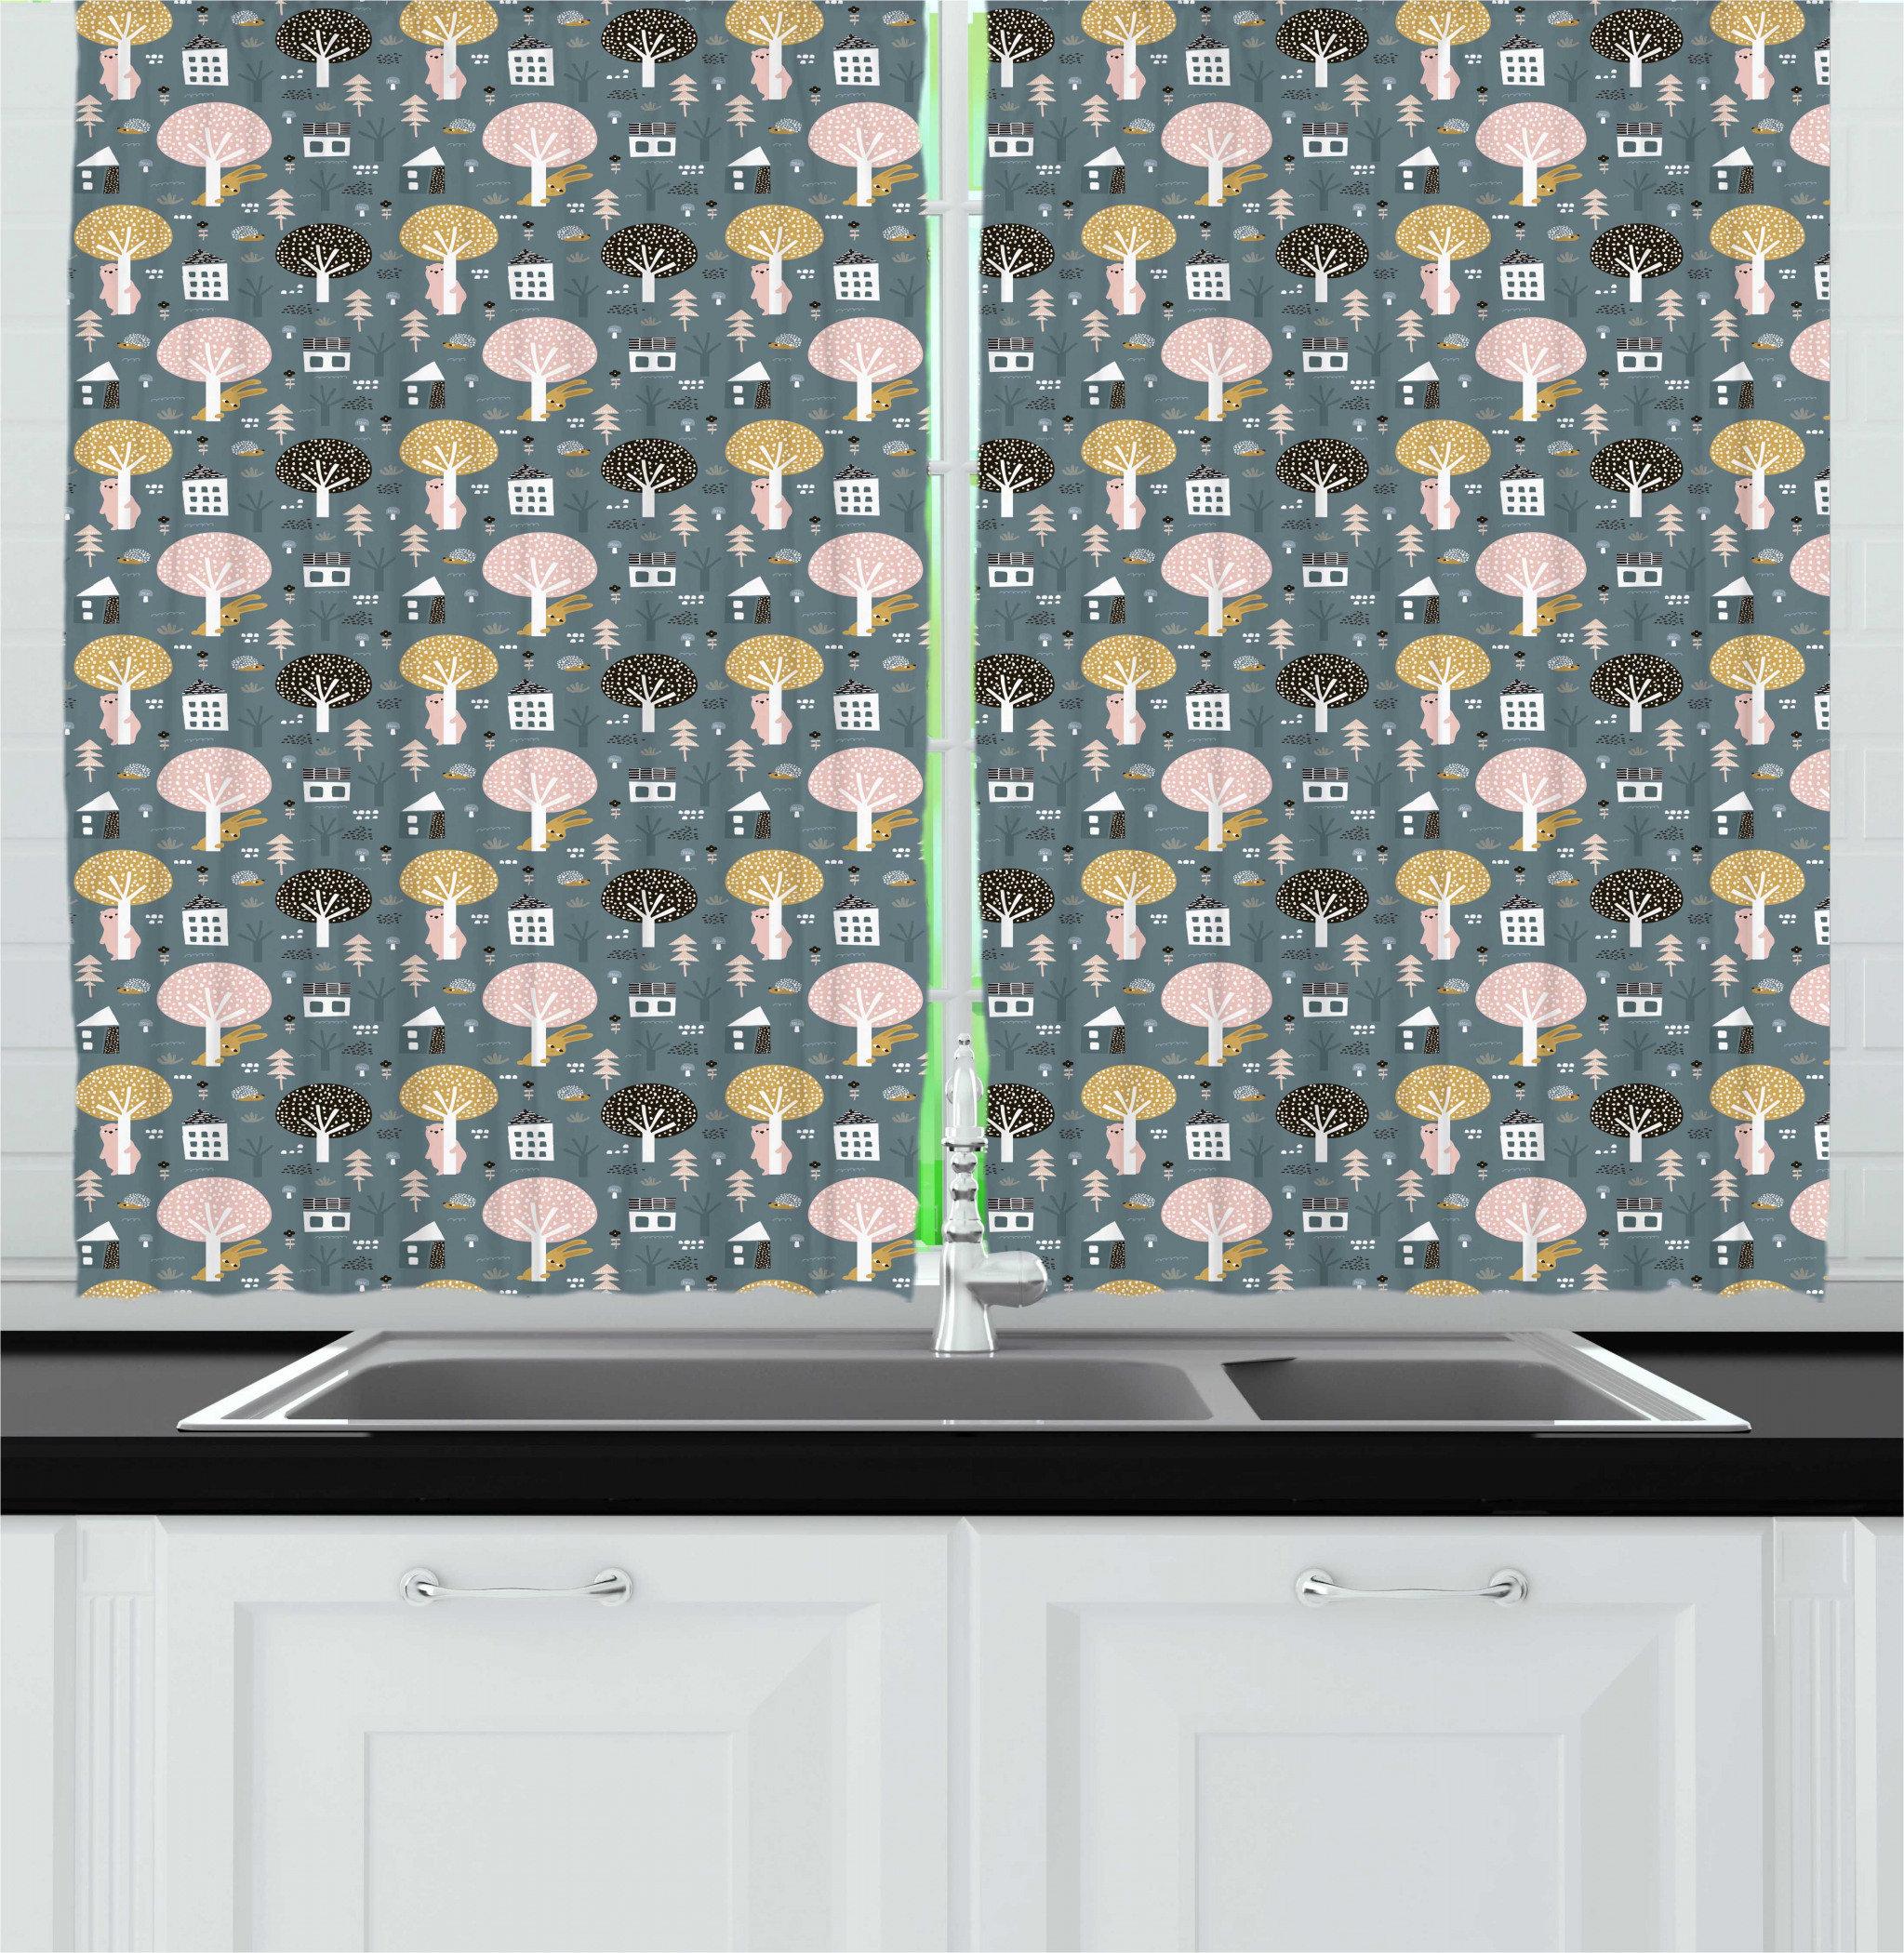 East Urban Home Doodle Cartoon Bears Bunny Hedgehog Trees And Floral Houses Branch Baby Shower Nursery Kitchen Curtain Wayfair